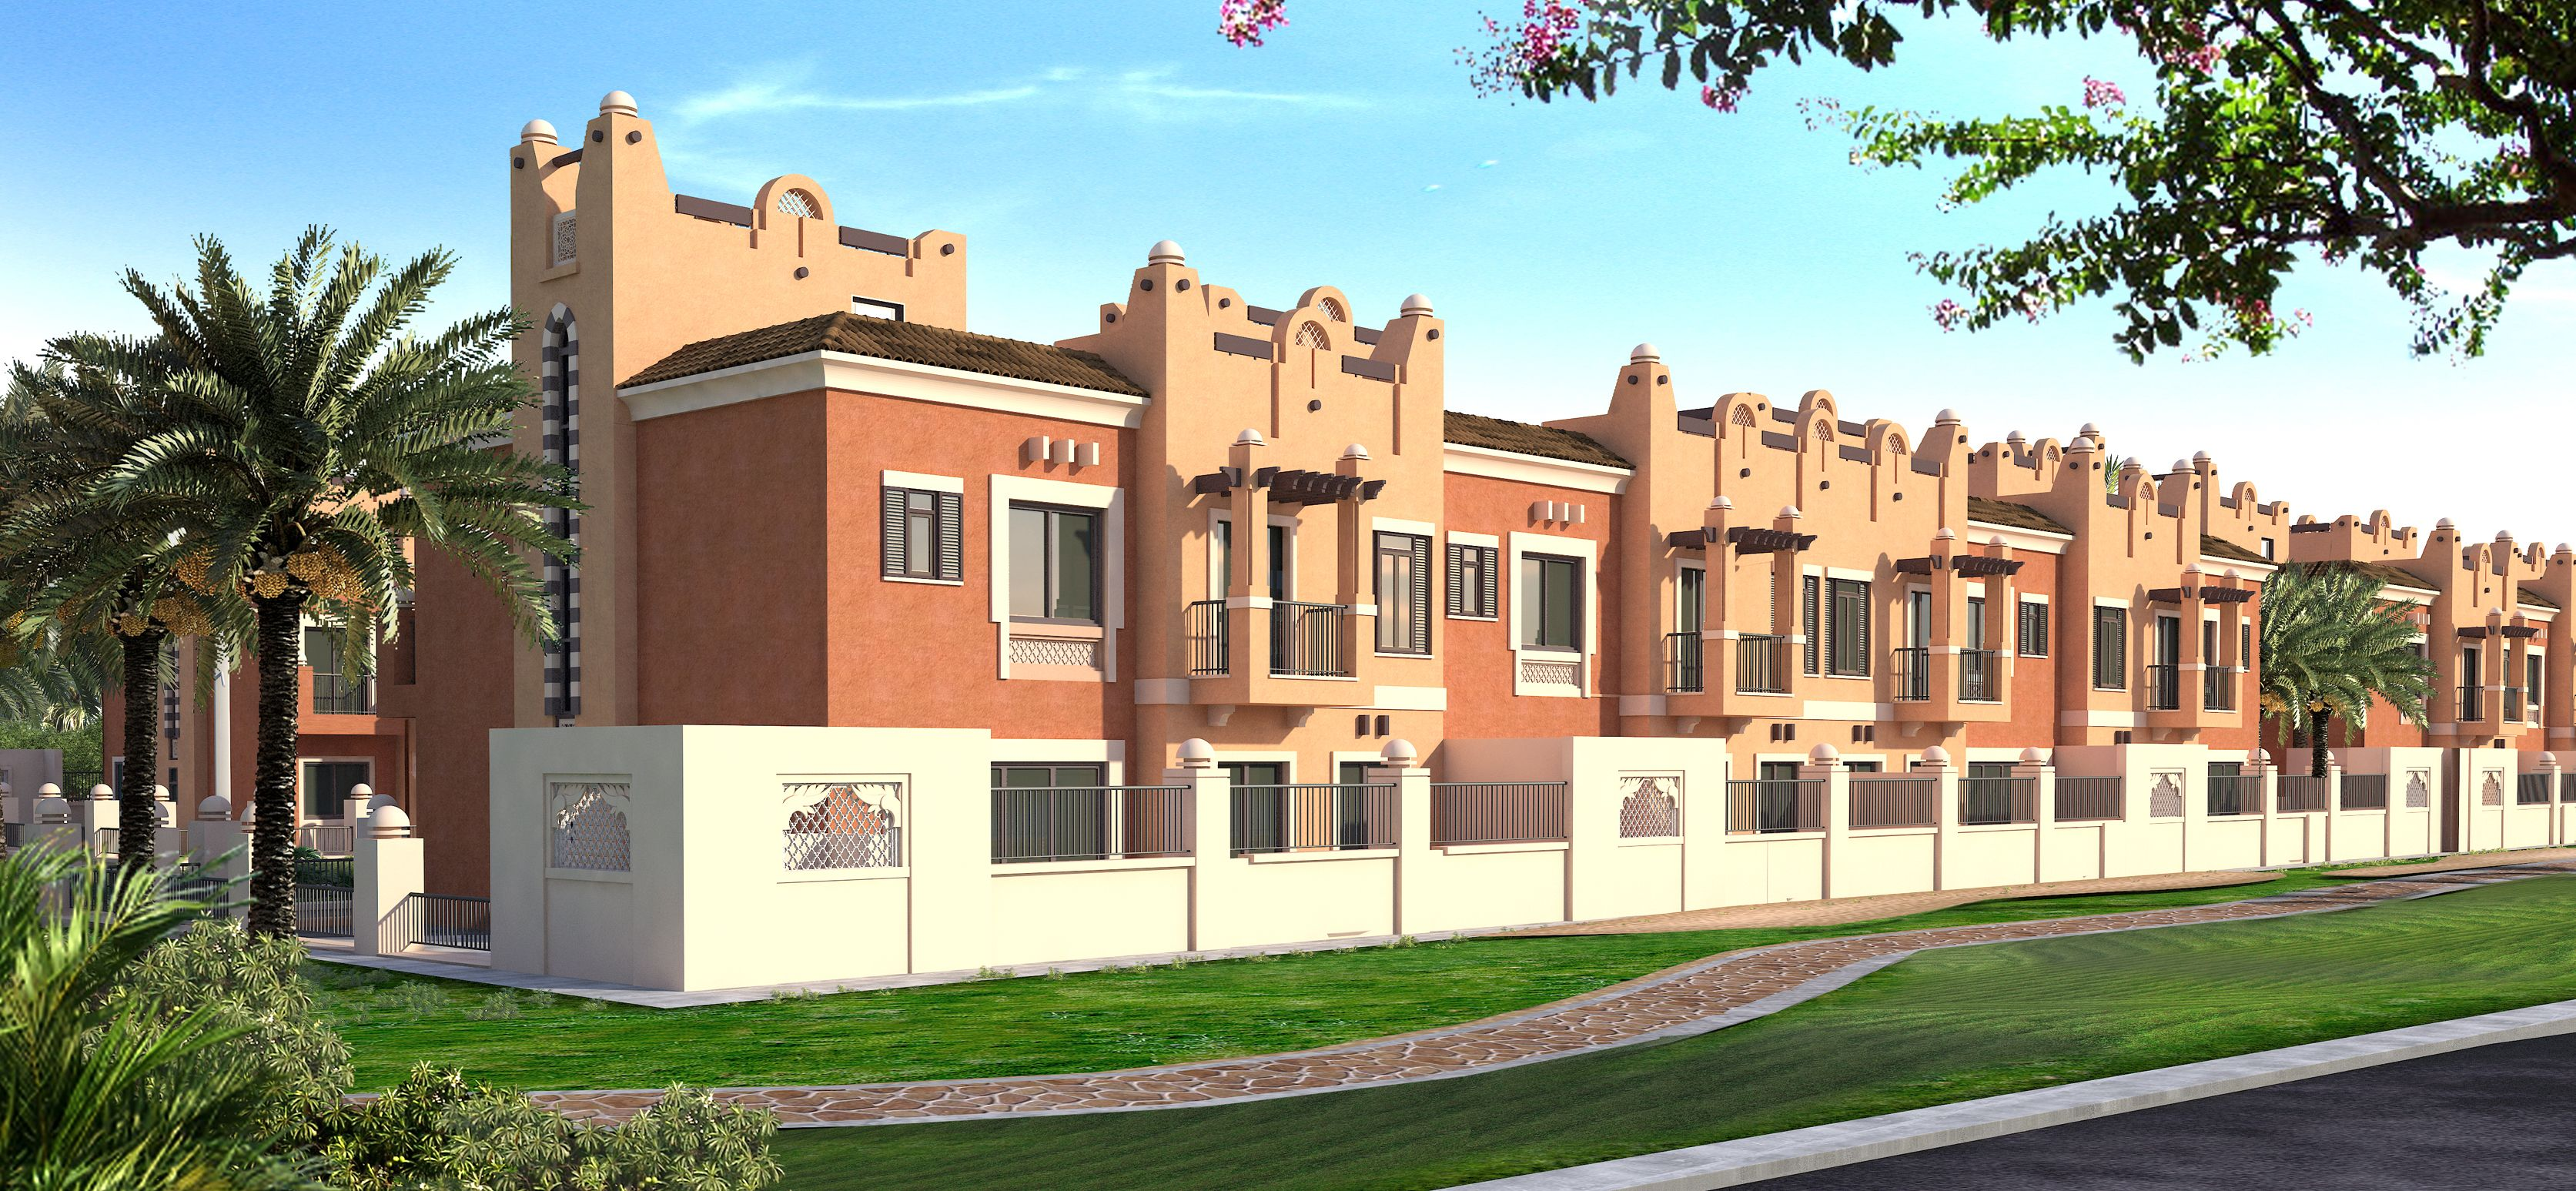 dubai dubaisportscity apartment To view properties for